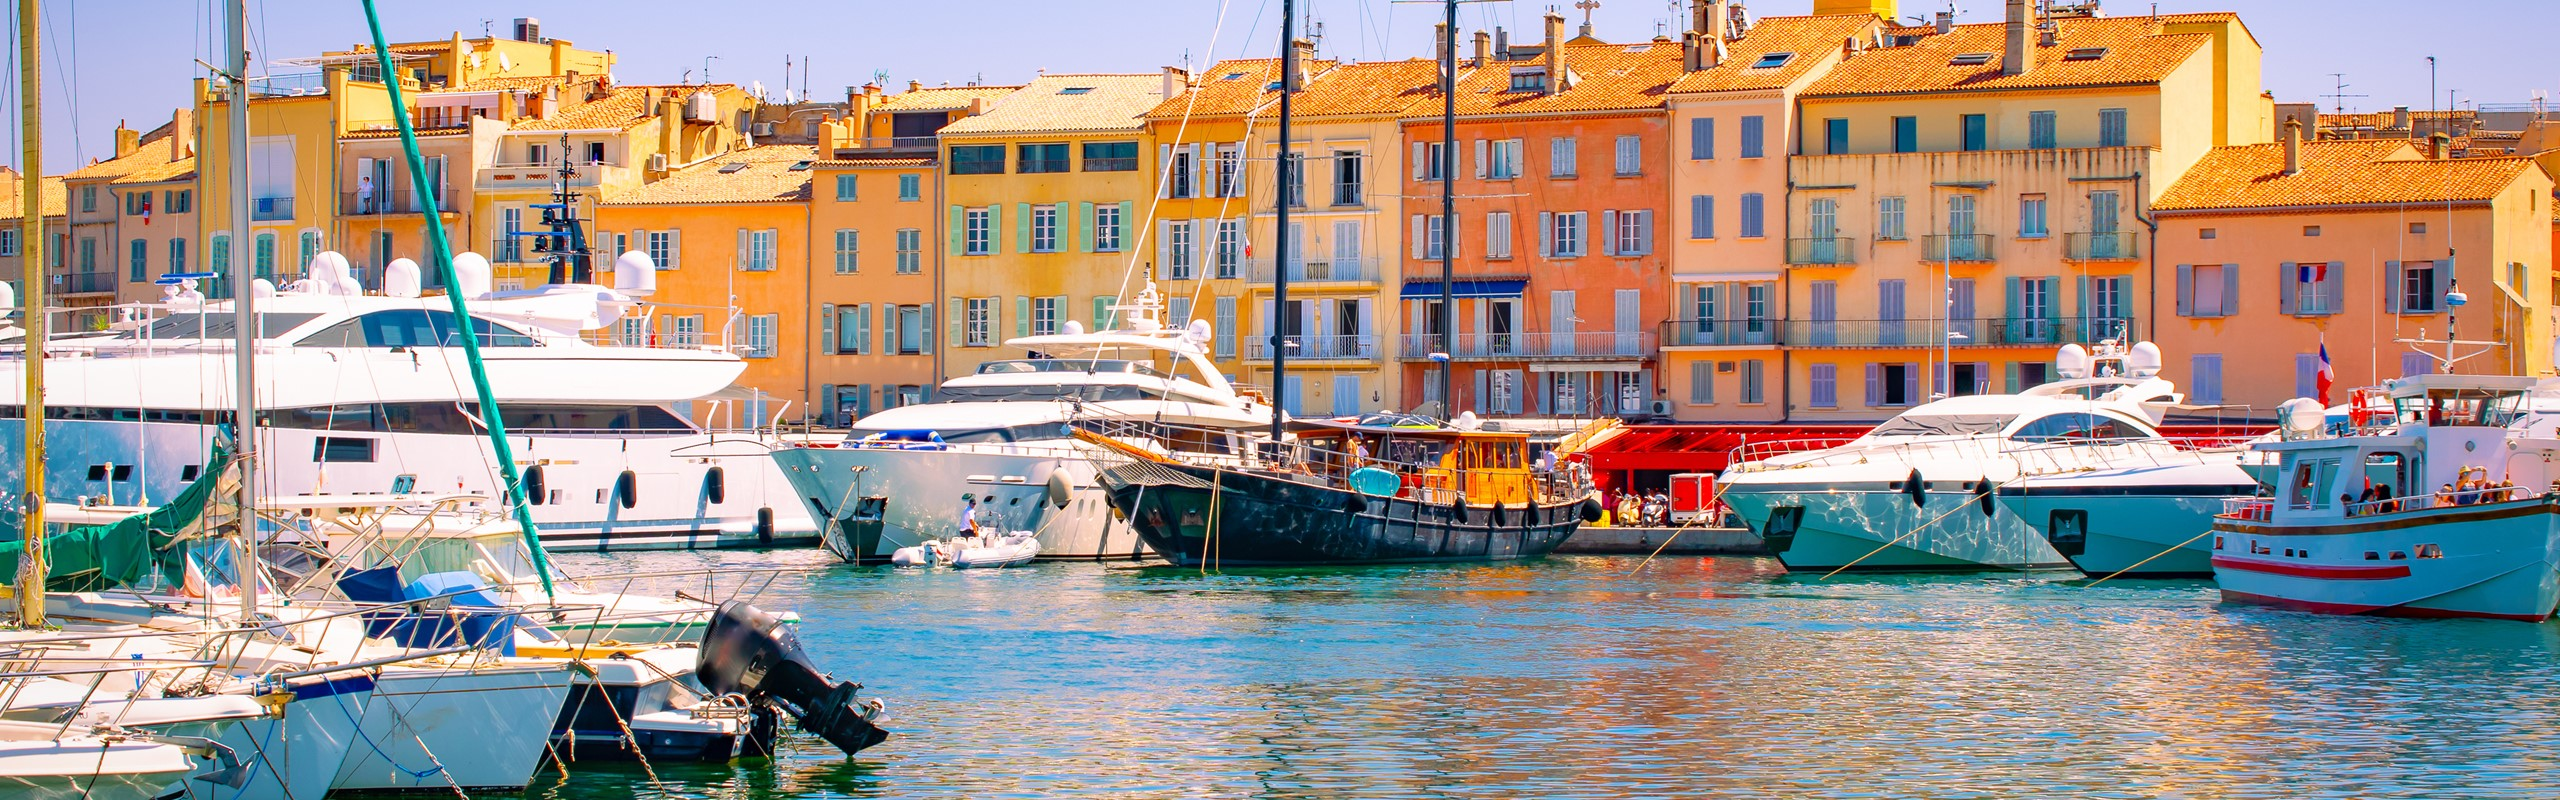 Saint Tropez Water